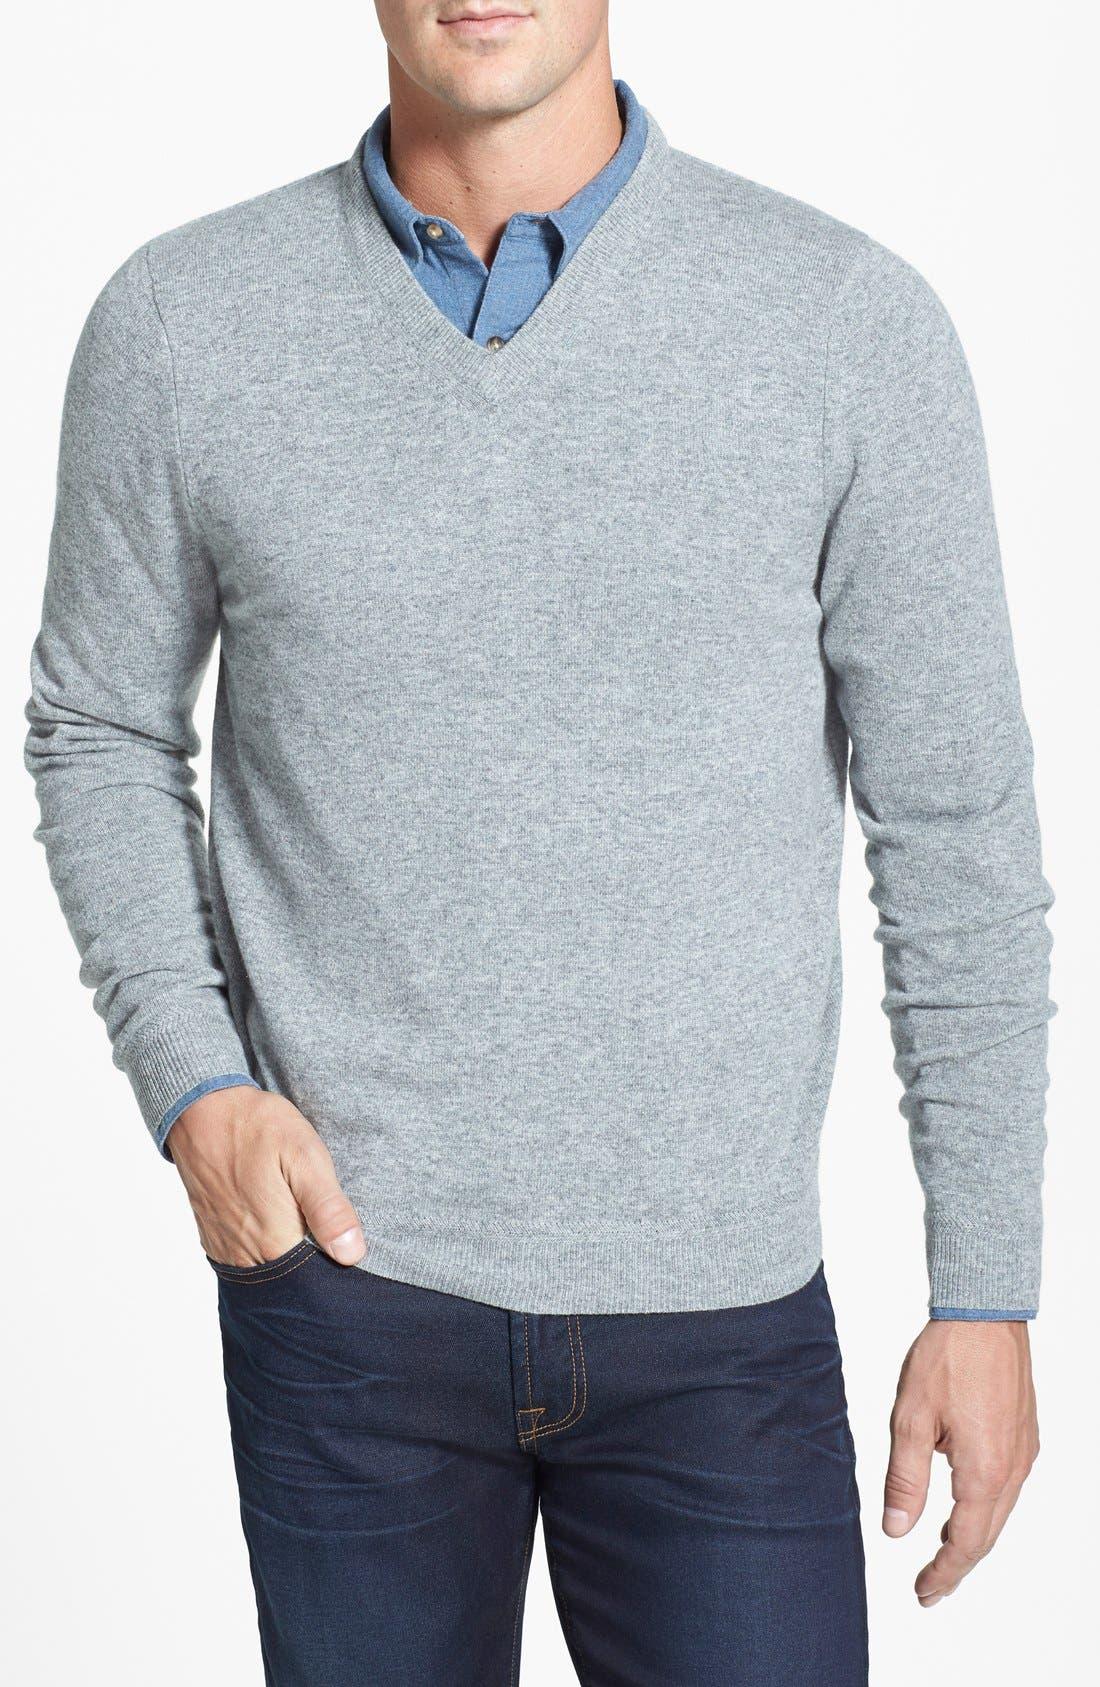 Alternate Image 1 Selected - John W. Nordstrom® V-Neck Cashmere Sweater